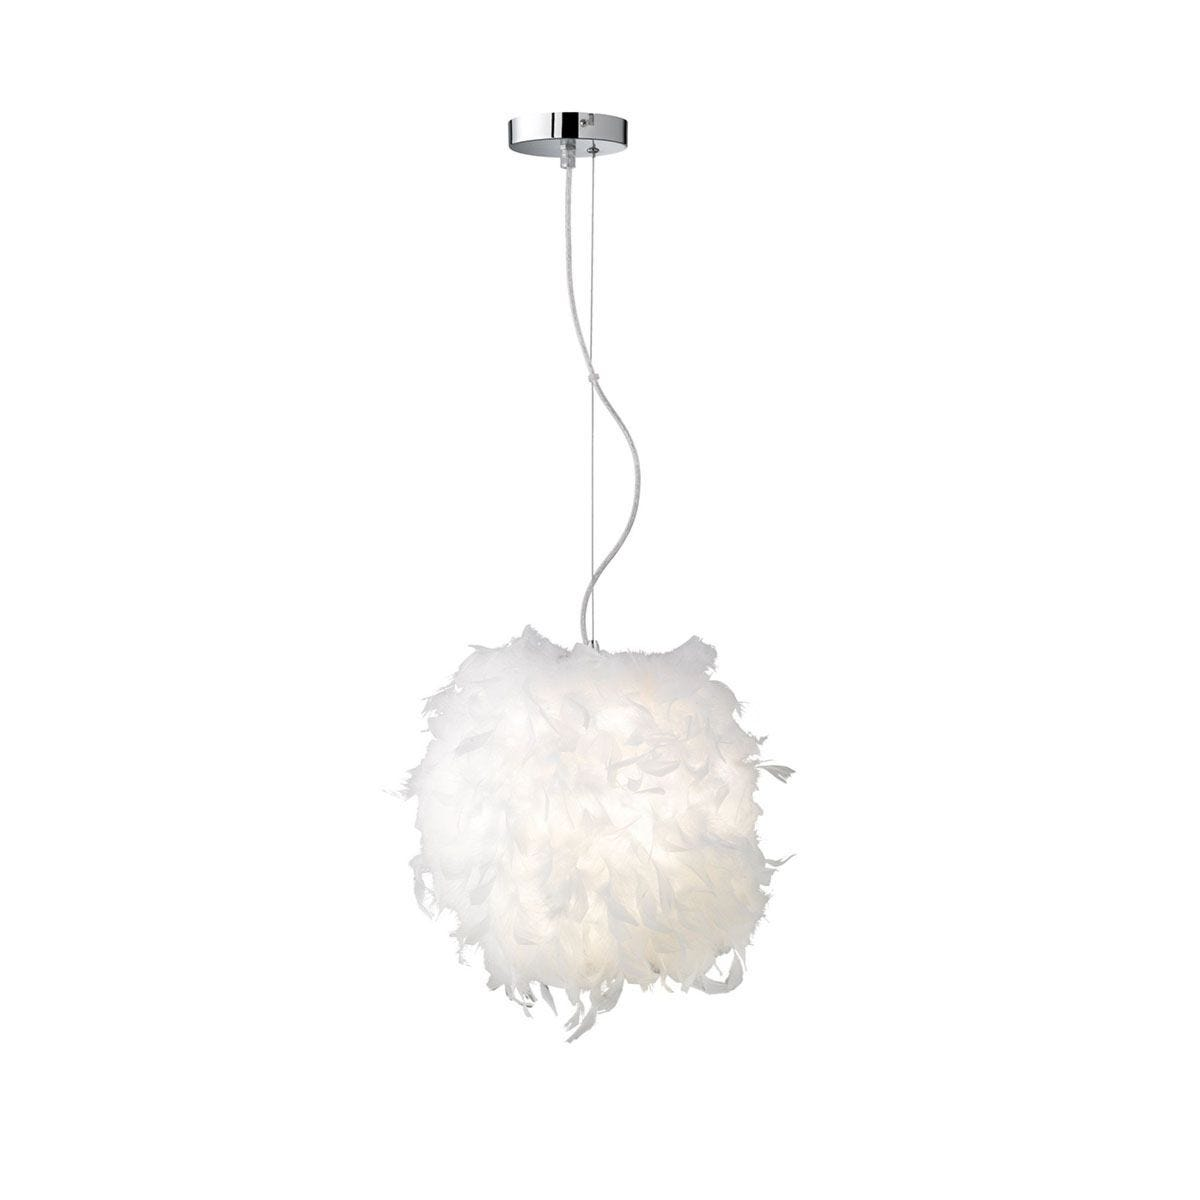 Wofi Ariana Pendant Ceiling Light - White